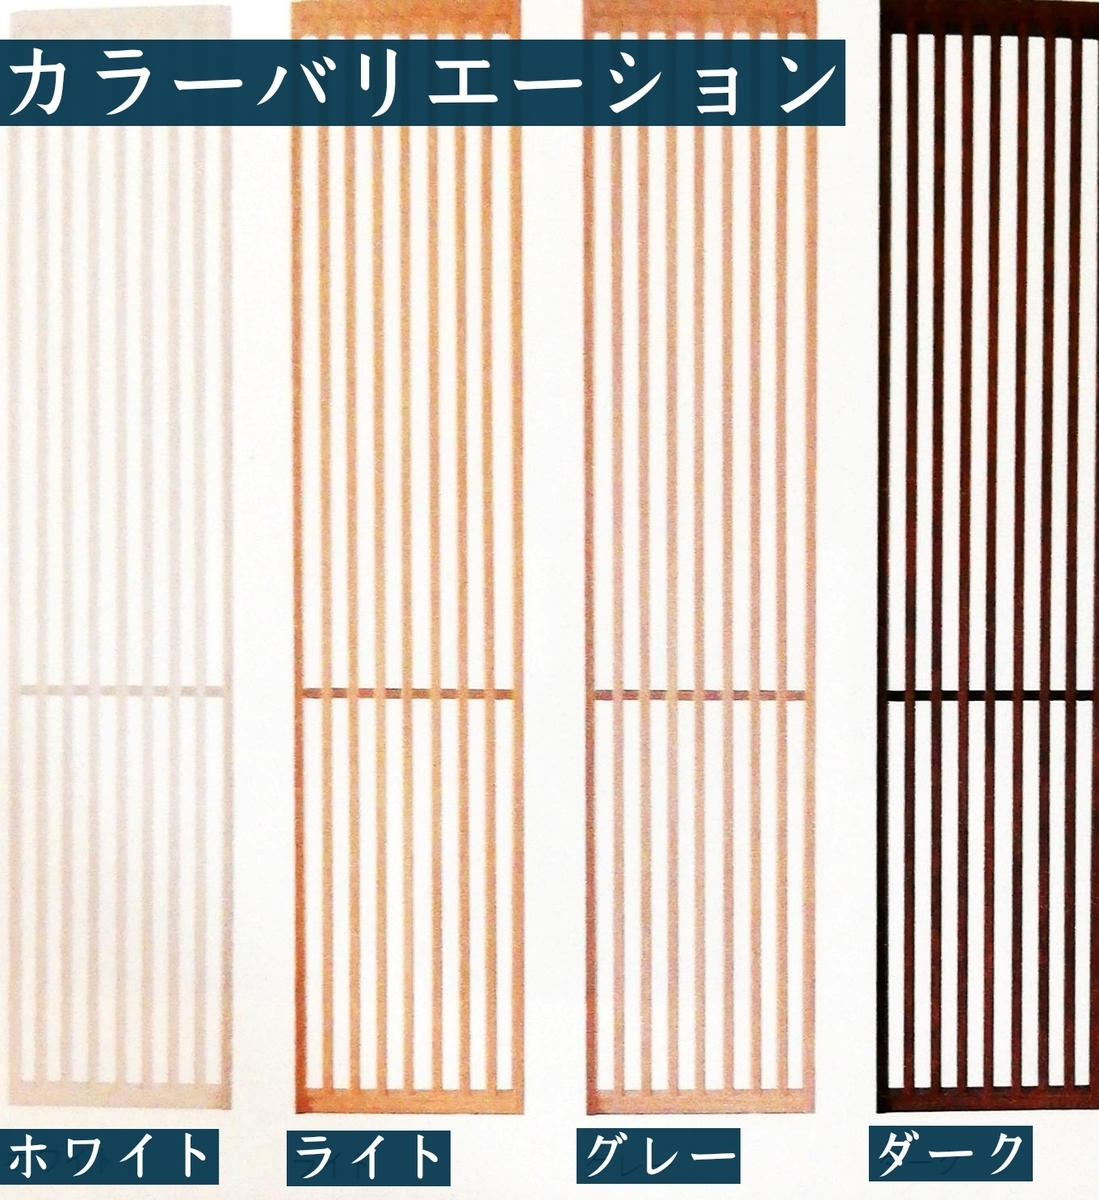 f:id:shioyan1130:20210131172821j:plain